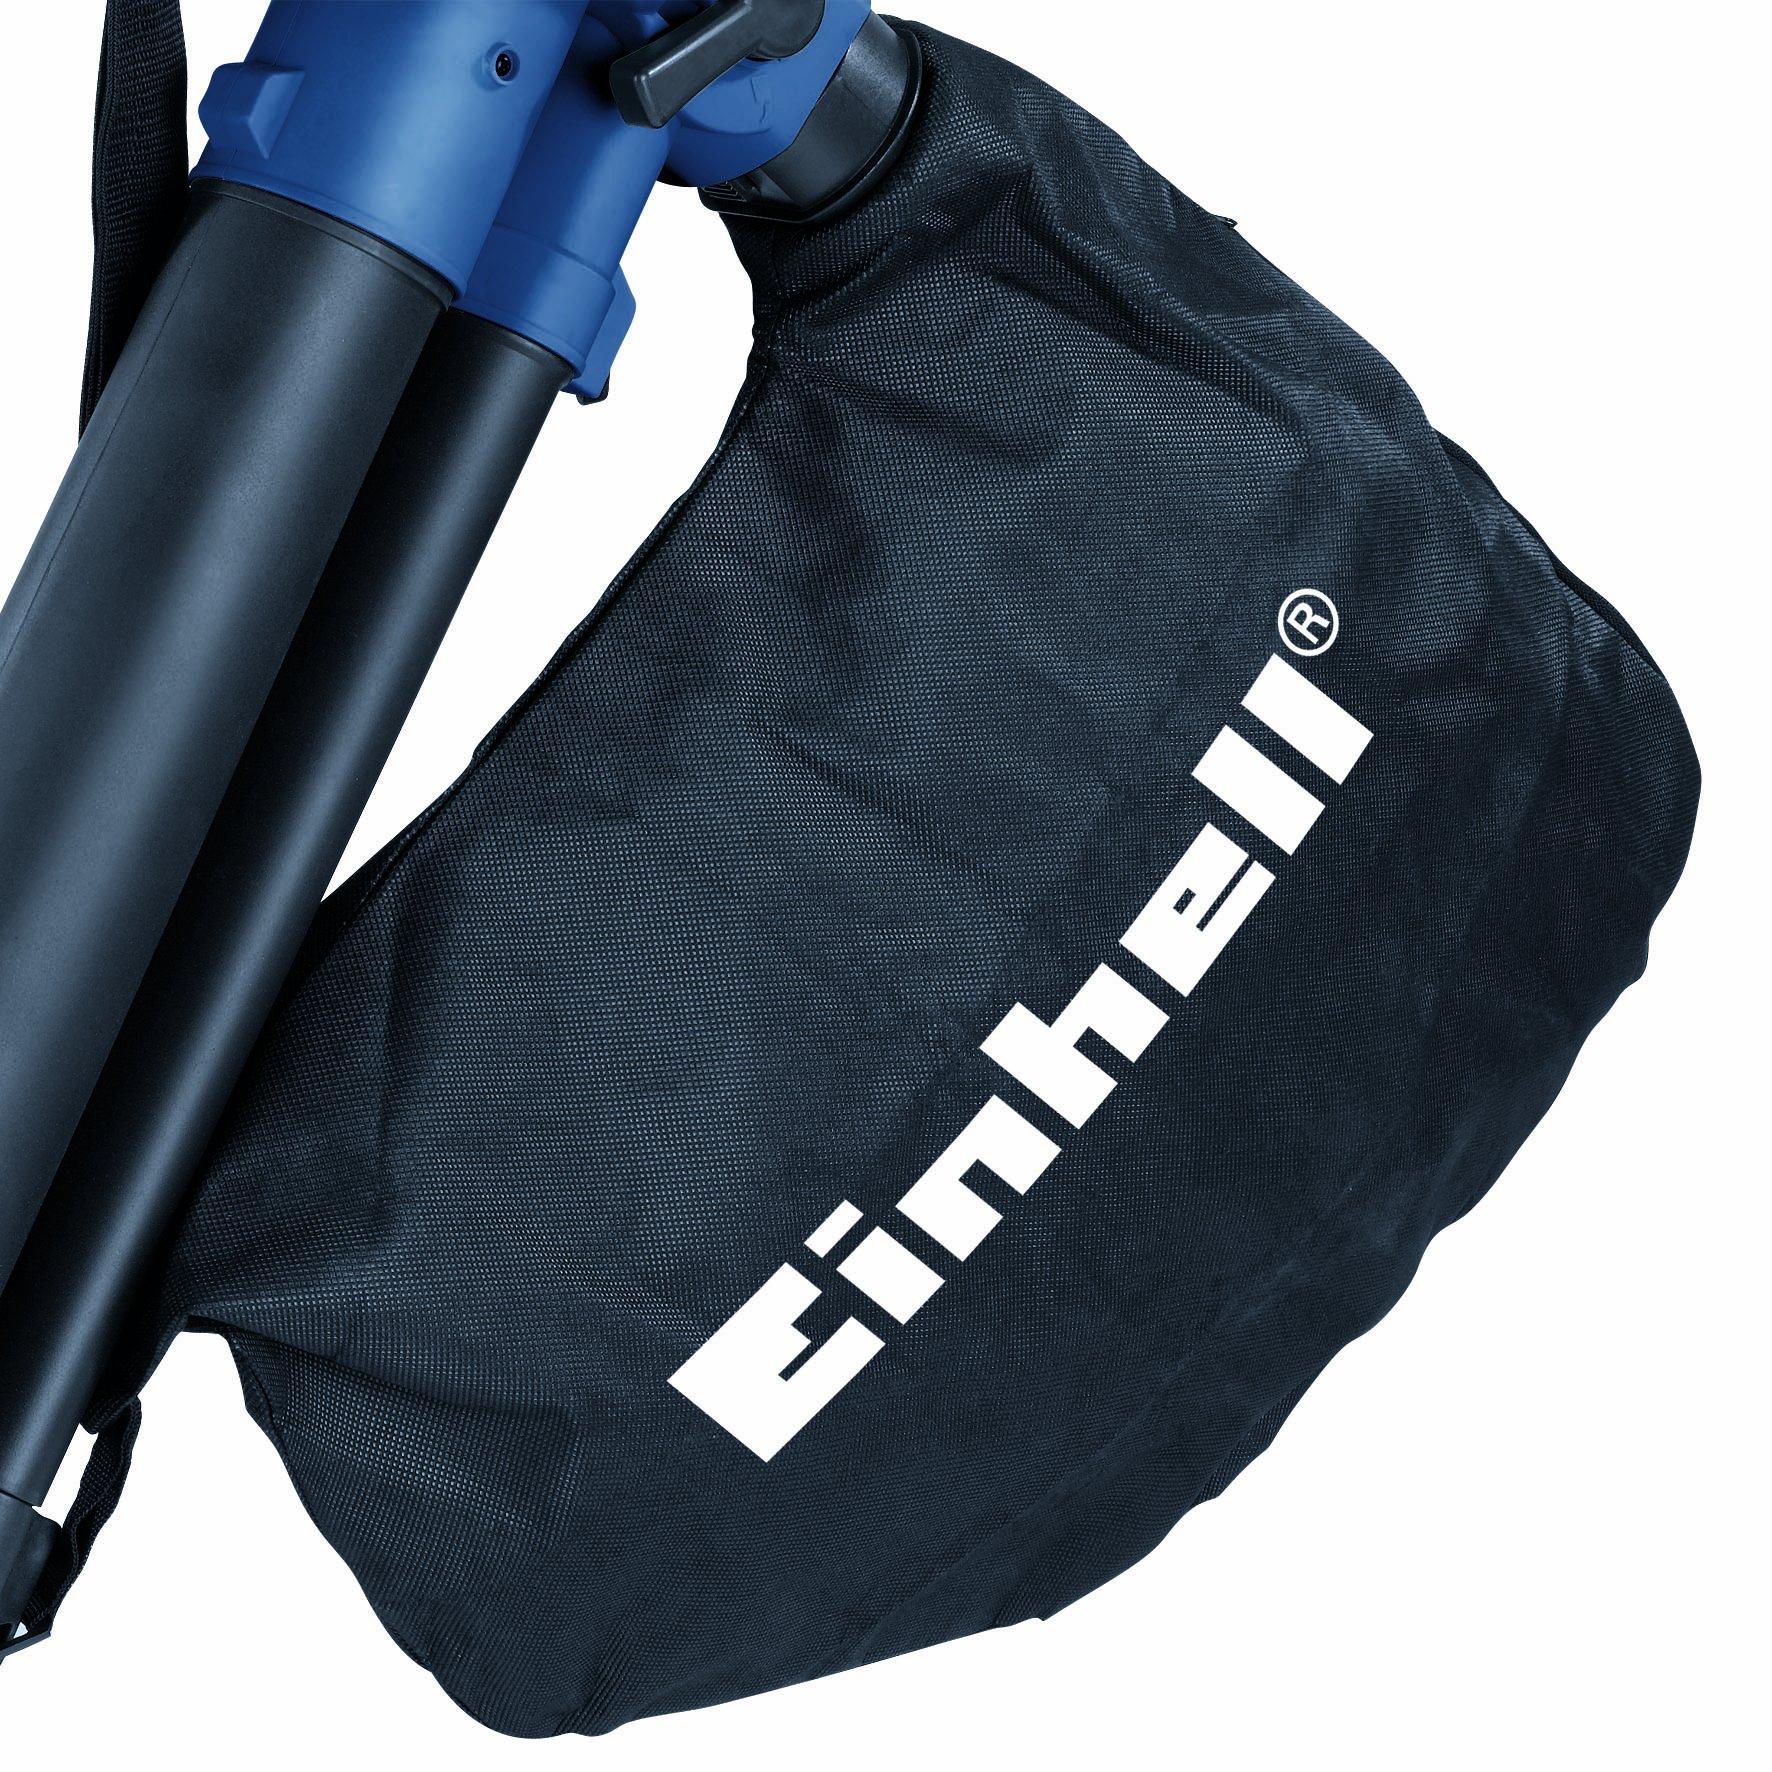 Einhell Elektro-Laubsauger/Bläser/Häcksler BG-EL 2500/2 E, bis 240 km/h, 40 L Fangsack